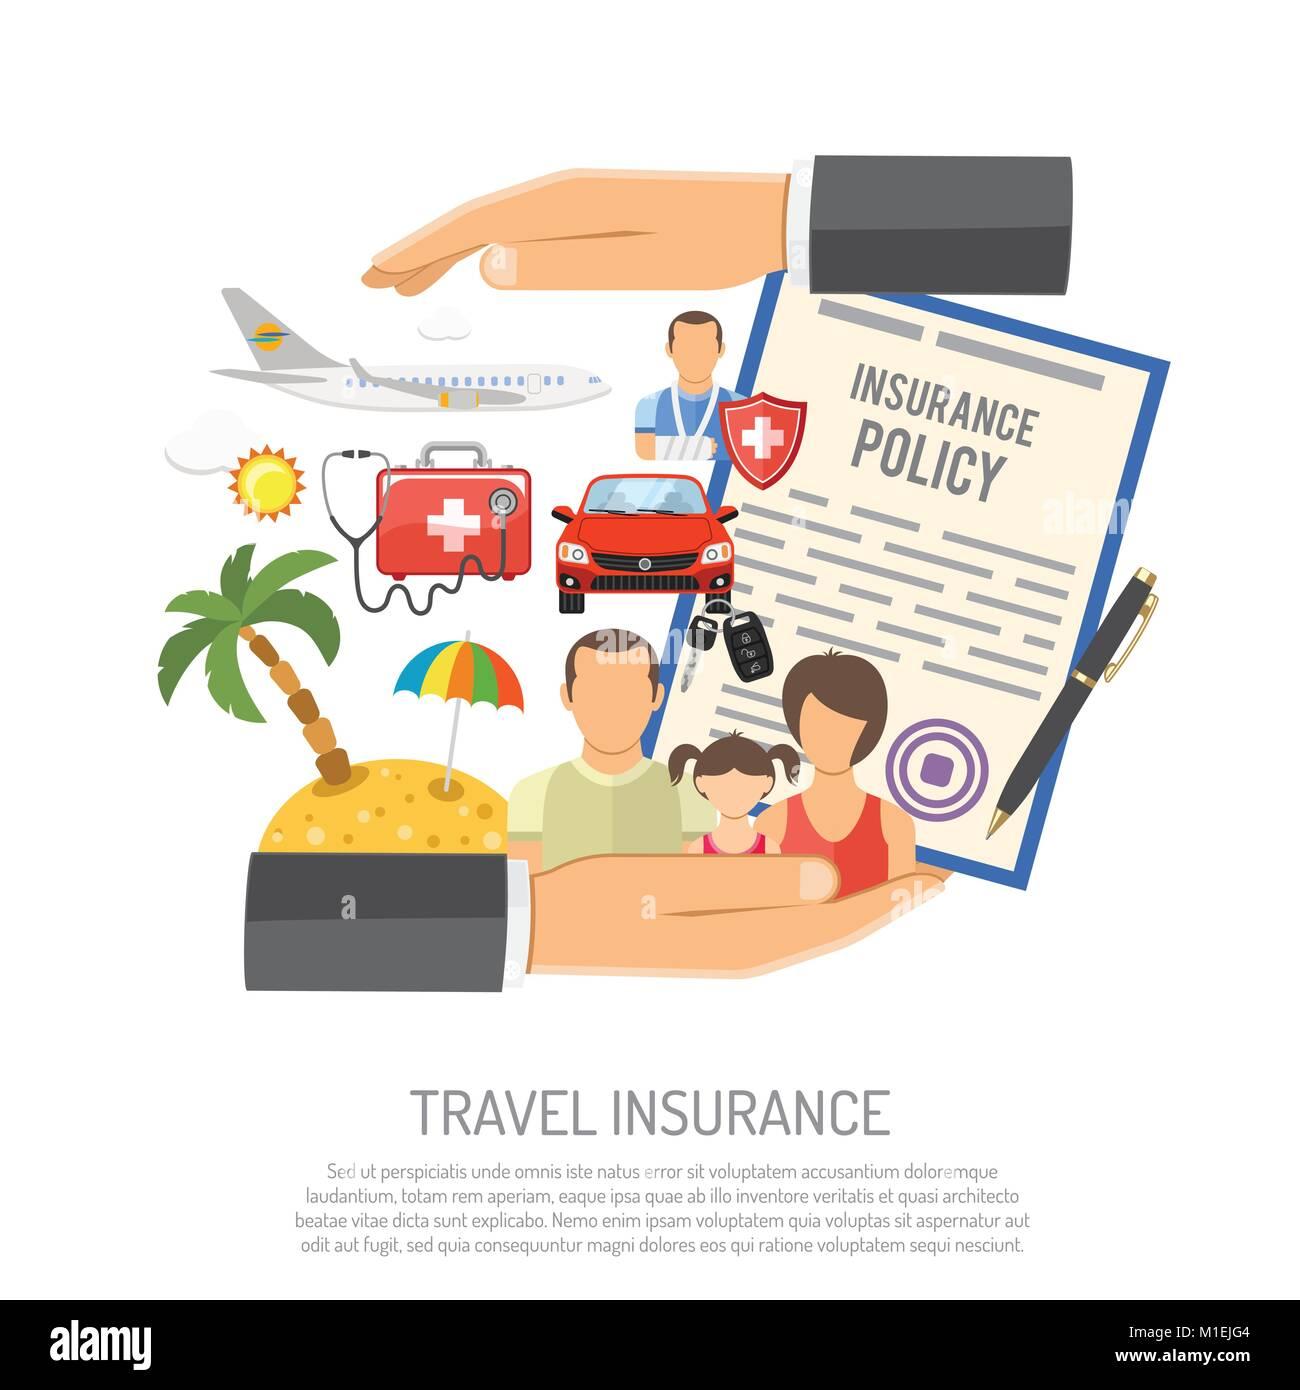 Travel Insurance Concept - Stock Image